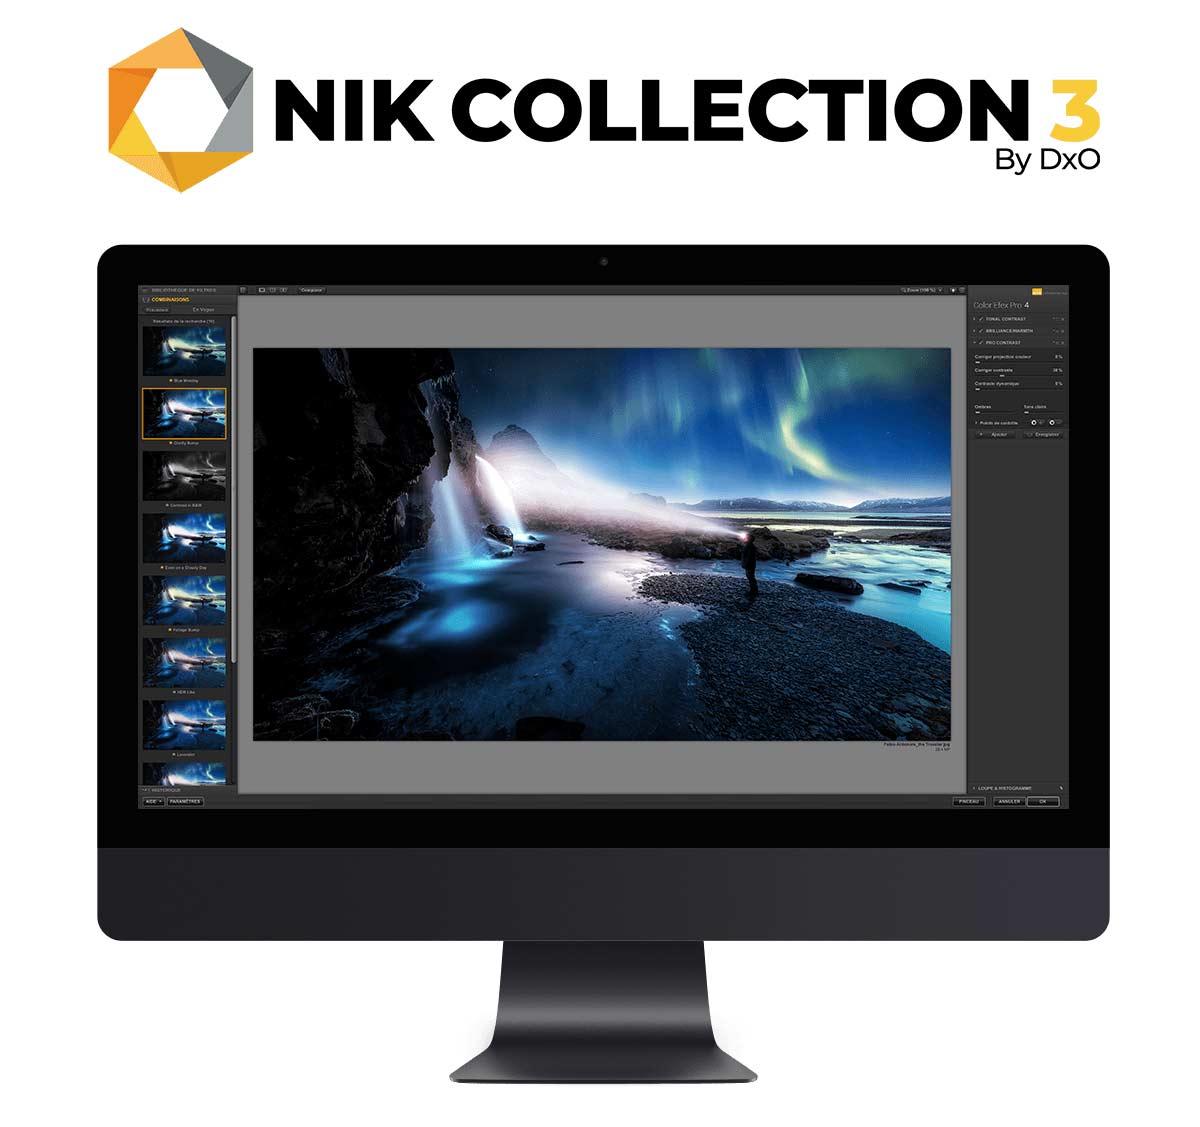 dxo-nik-collection-3